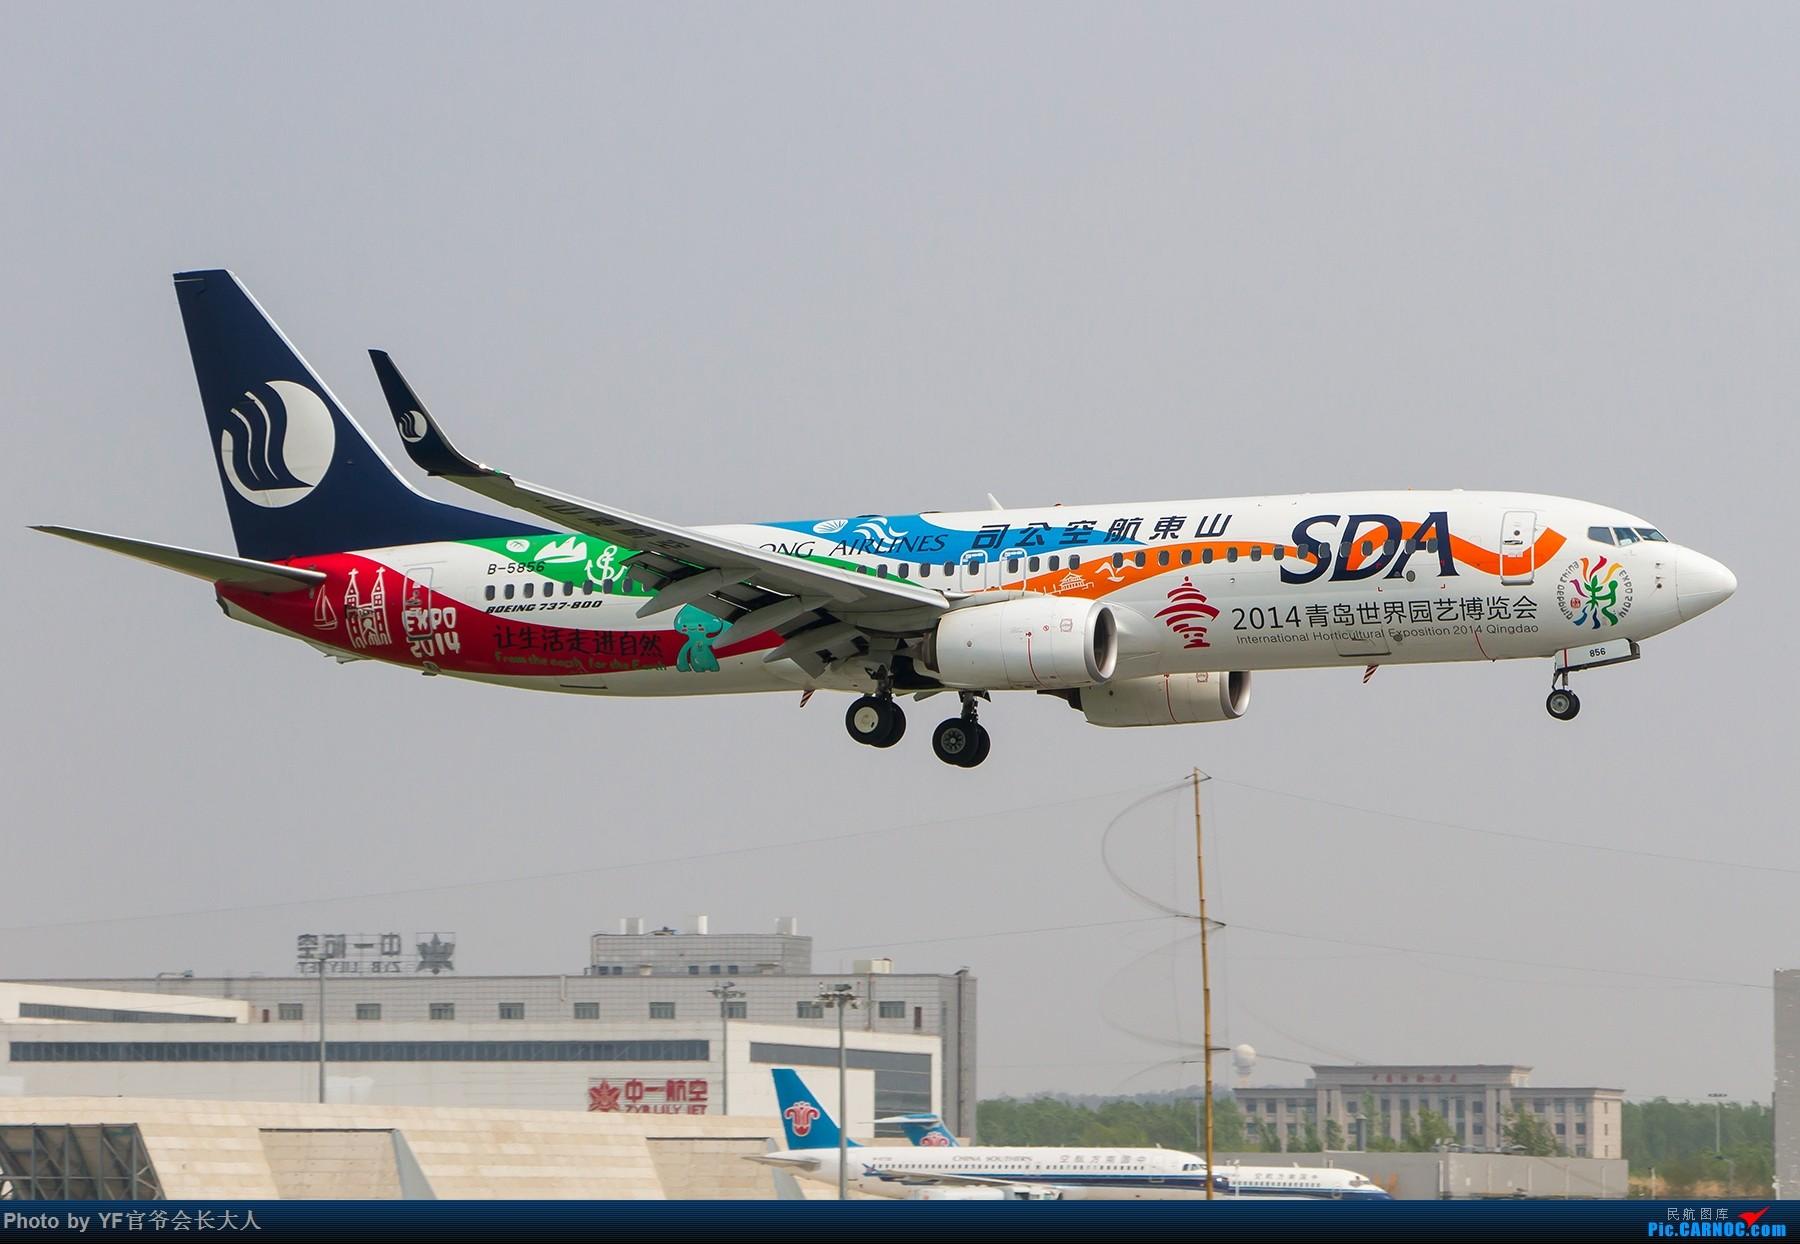 Re:[原创]【ZYTX】轻易不拍机,拍就要拍个过瘾!(新开的酷鸟,亚洲大西洋,顺带碰上朝韩两国的好货) BOEING 737-800 B-5856 中国沈阳桃仙国际机场